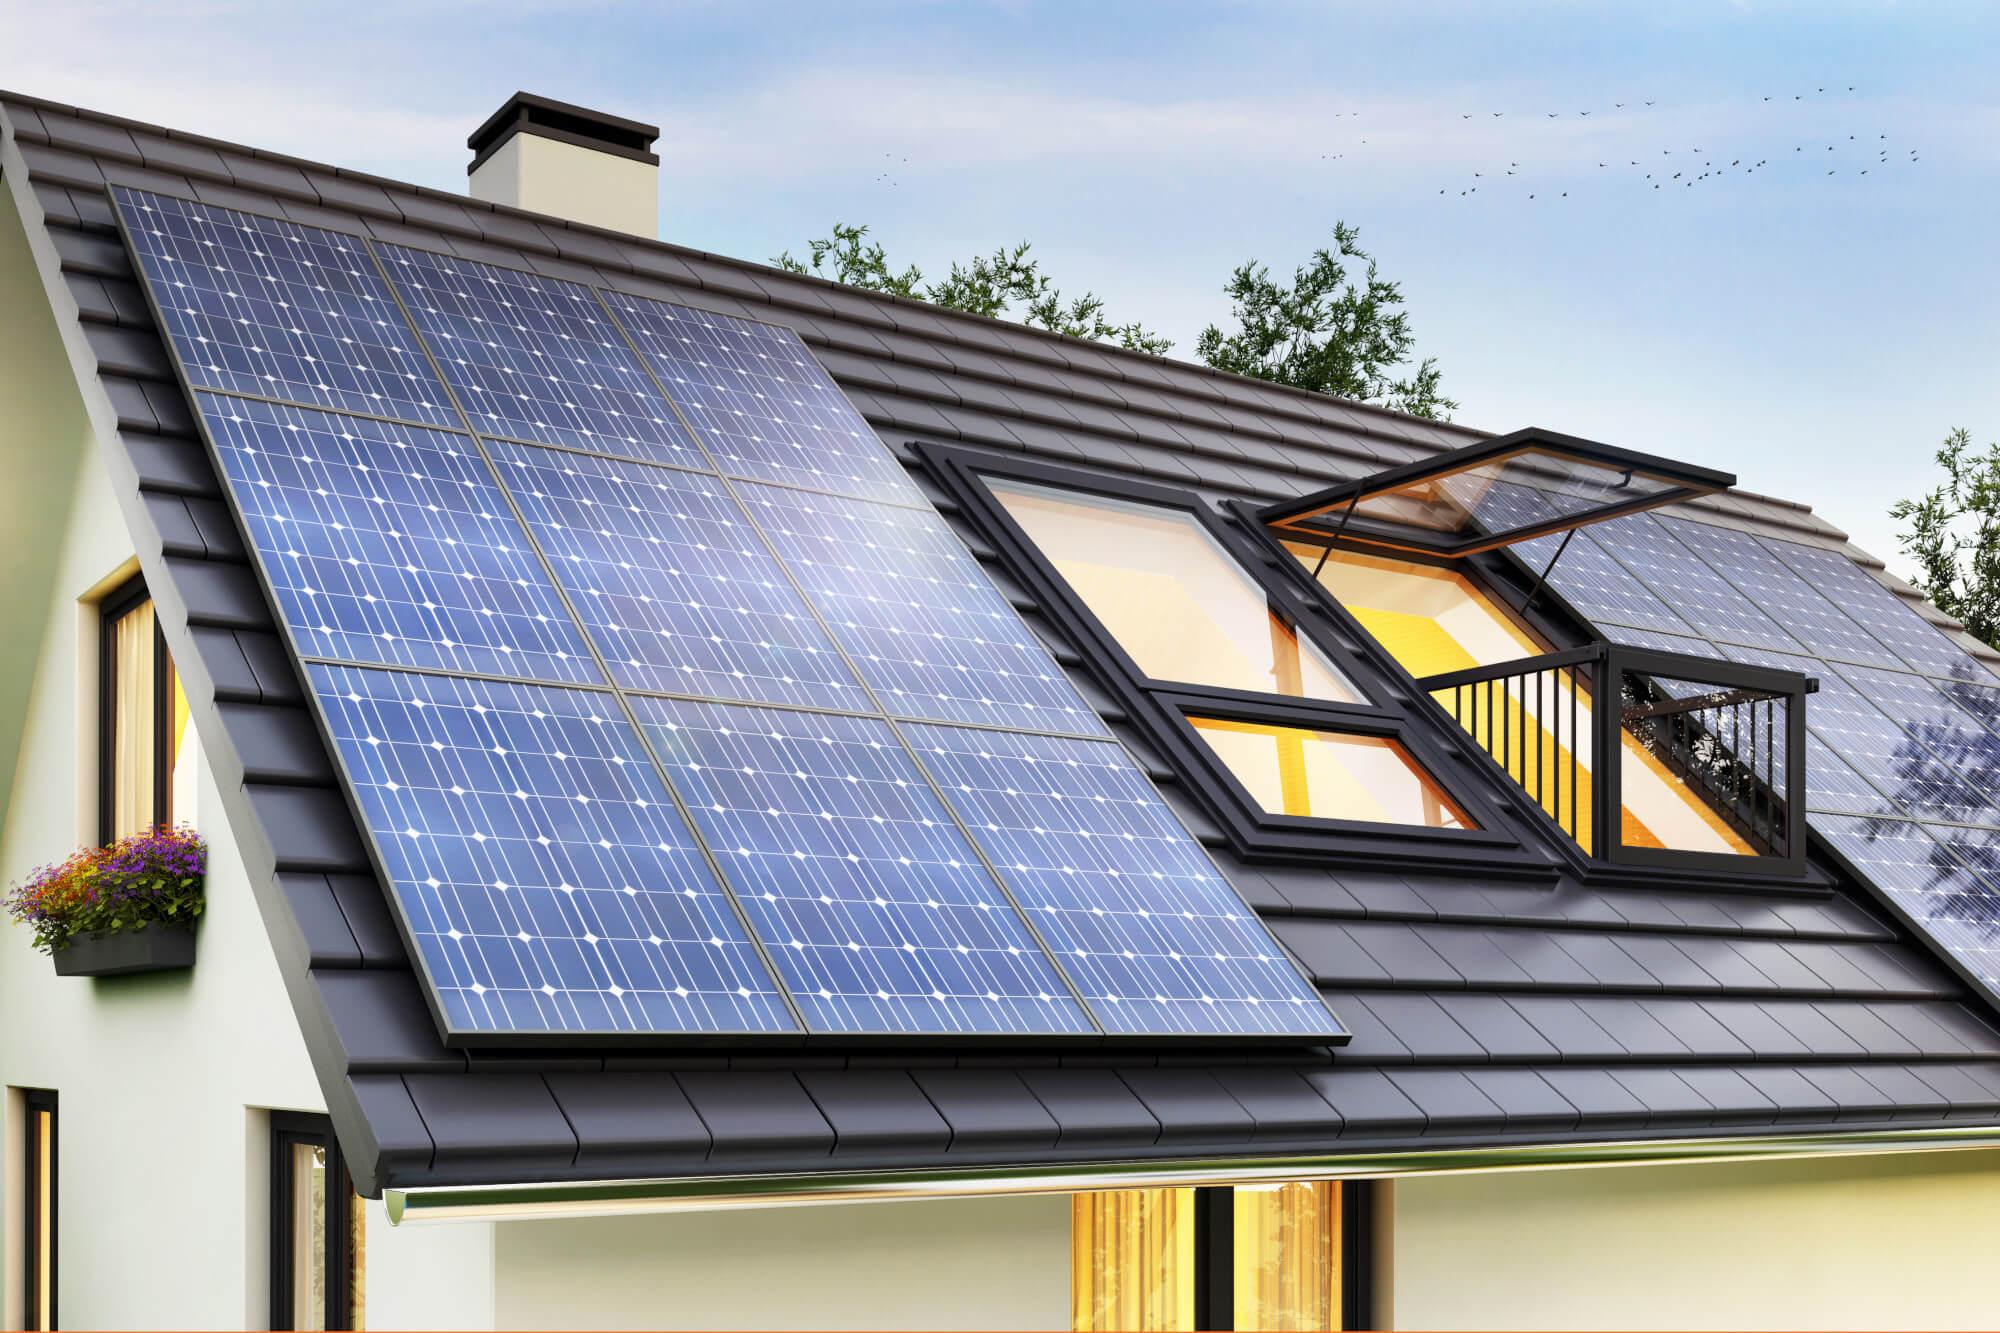 haus-mit-solarkollektoren-small